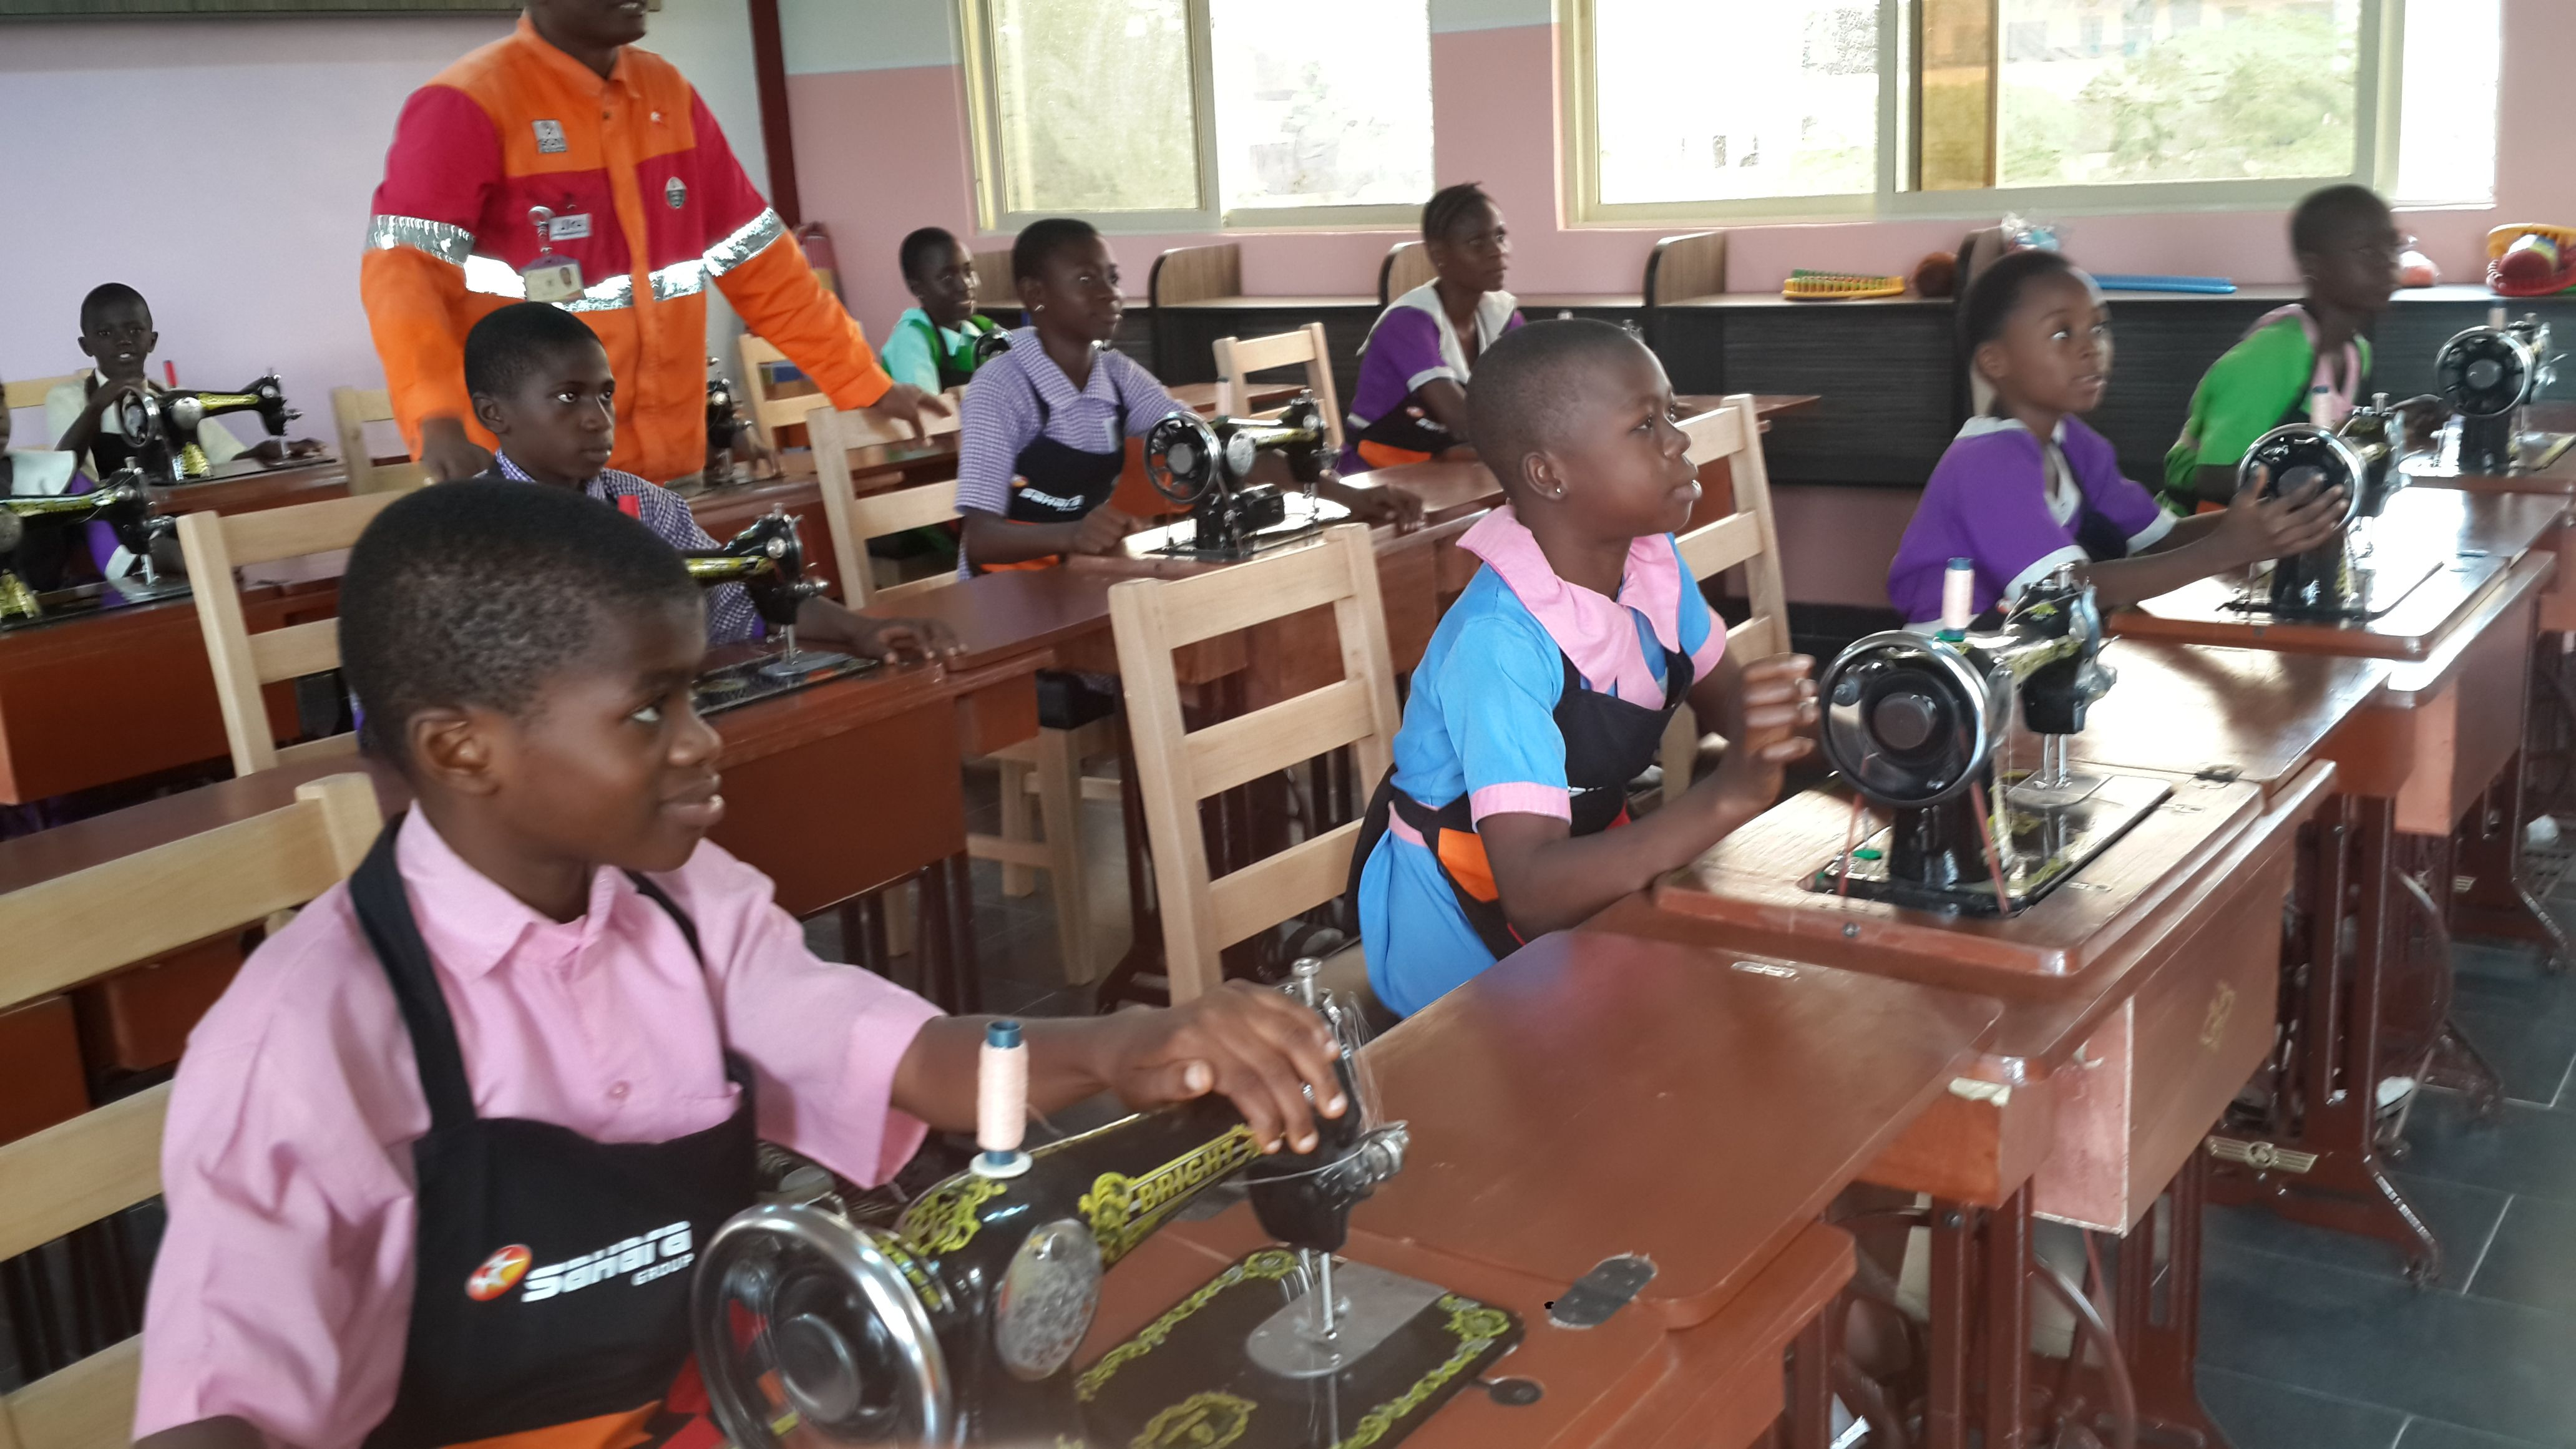 Sahara Foundation empowering kids at Oshodi, Lagos Nigeria